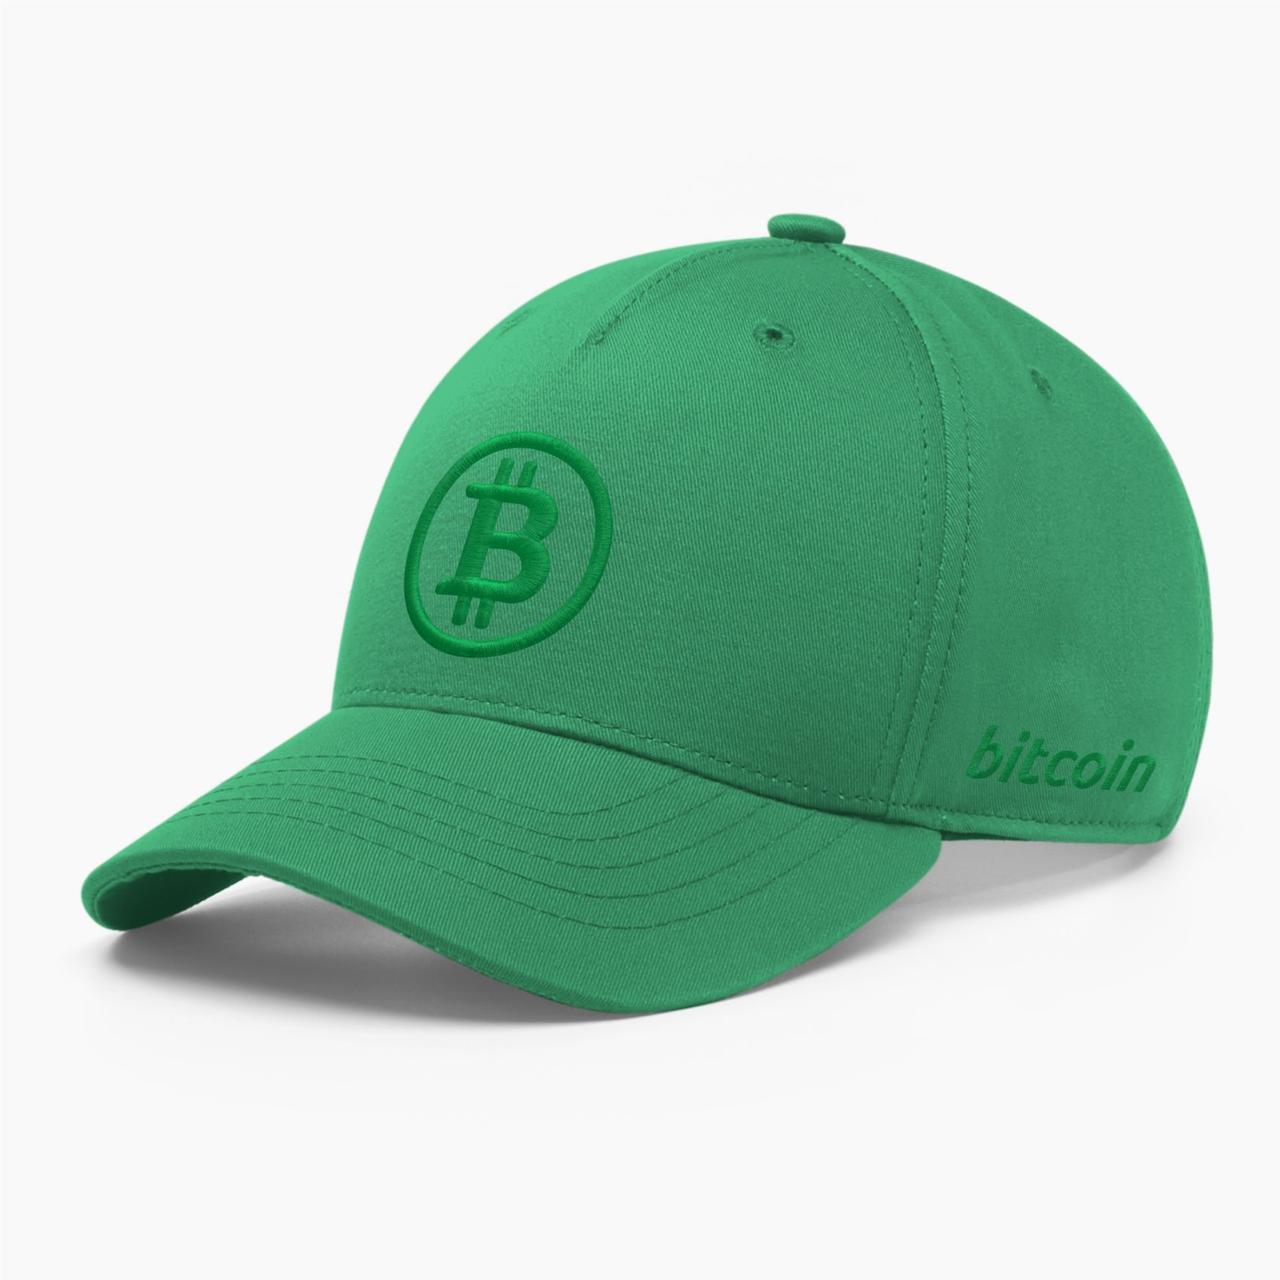 Кепка бейсболка INAL Биткоин Bitcoin BTC S / 53-54 RU Зеленый 2353